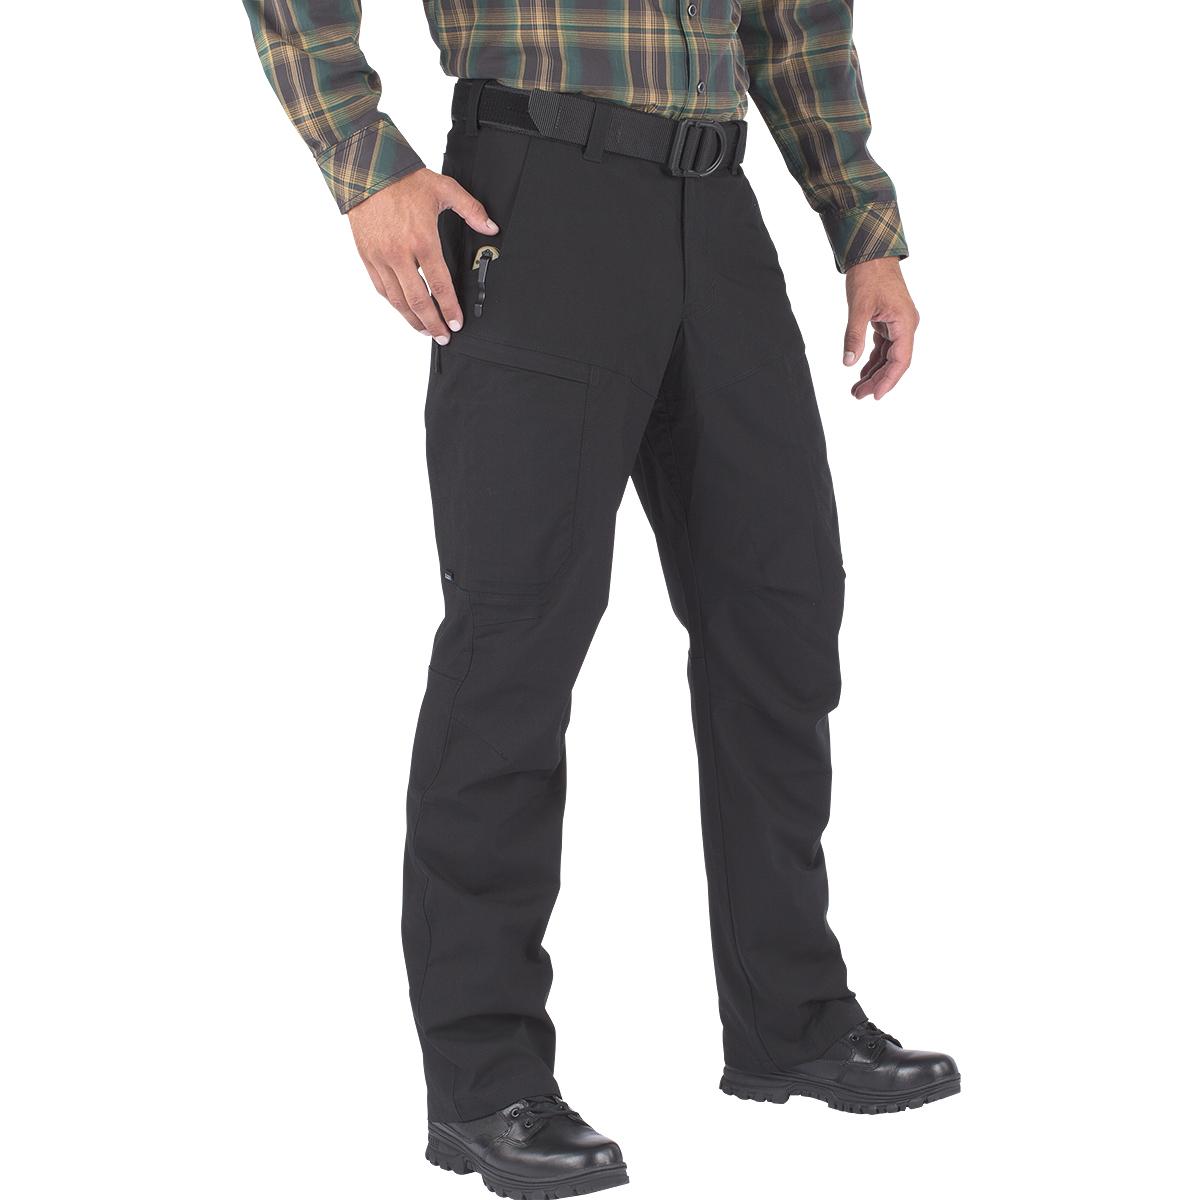 black tactical cargo pants - photo #22